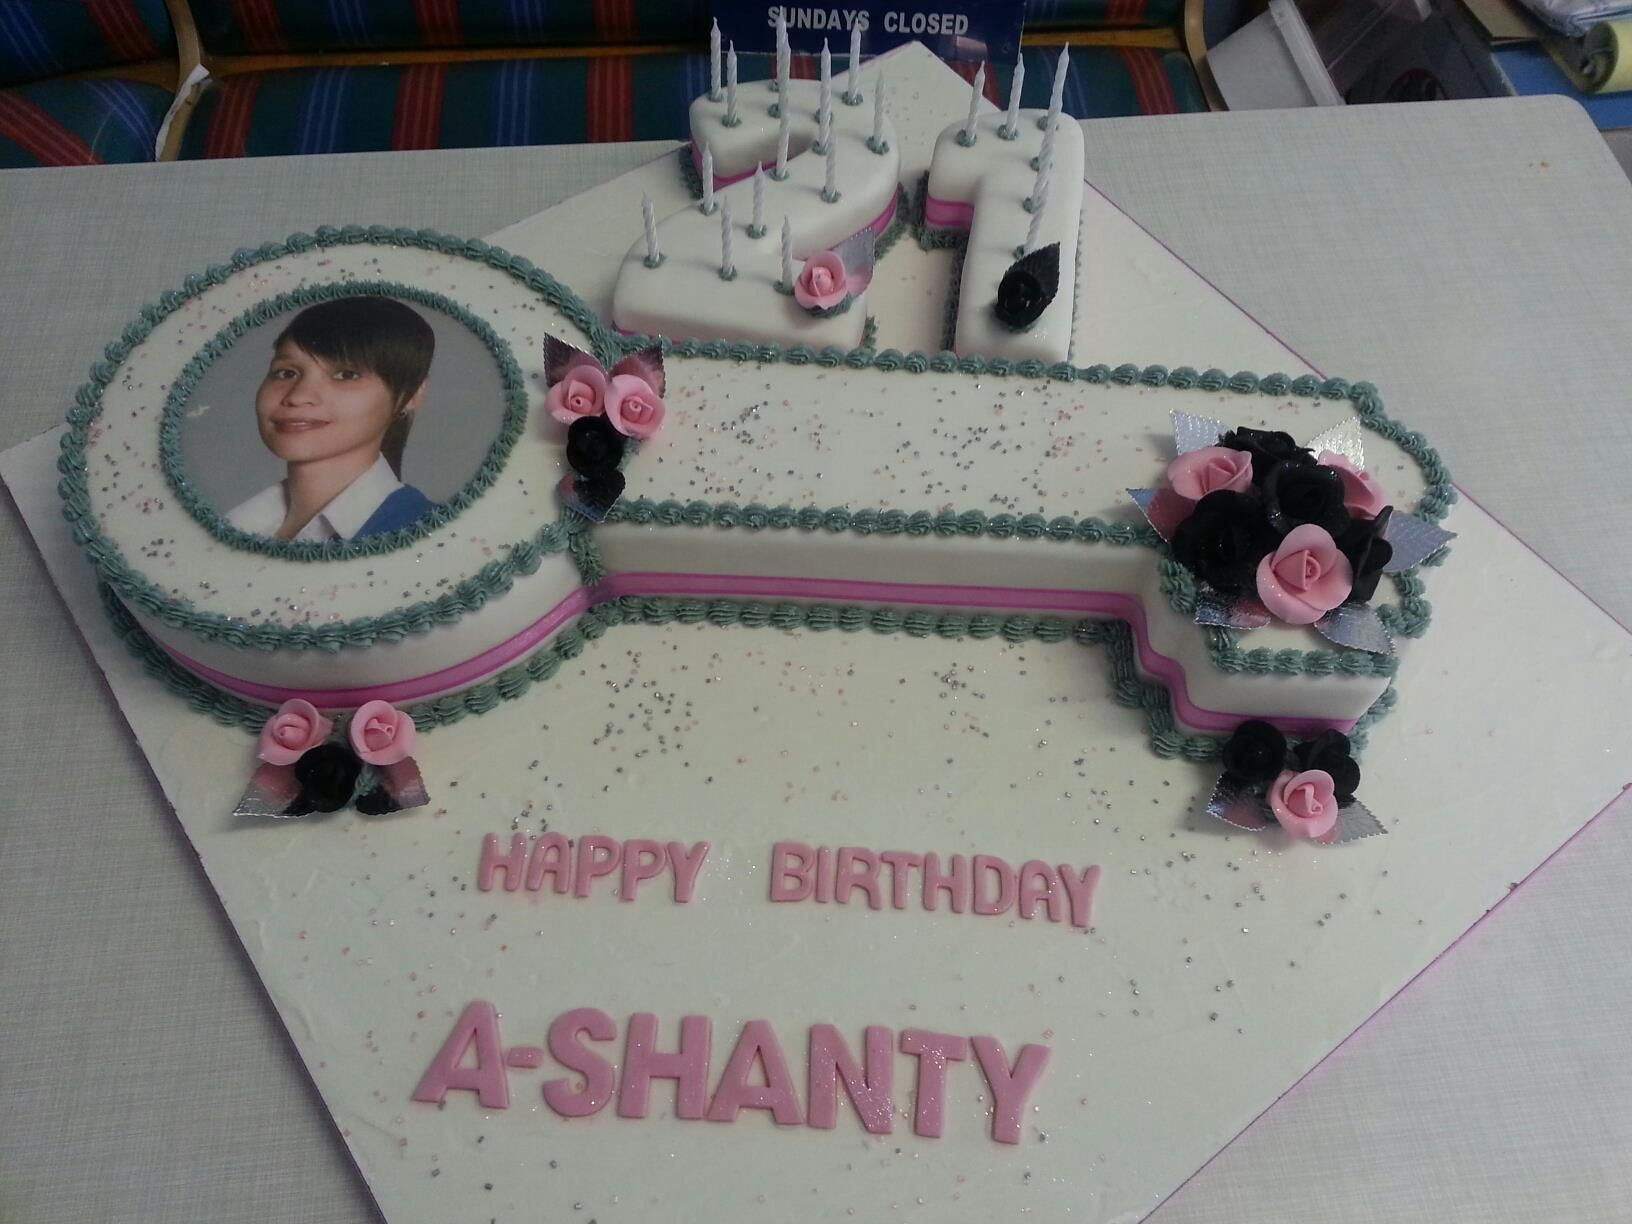 Strange 21St Birthday Key Cake With Number Cake Pink And Black Fondant Funny Birthday Cards Online Alyptdamsfinfo